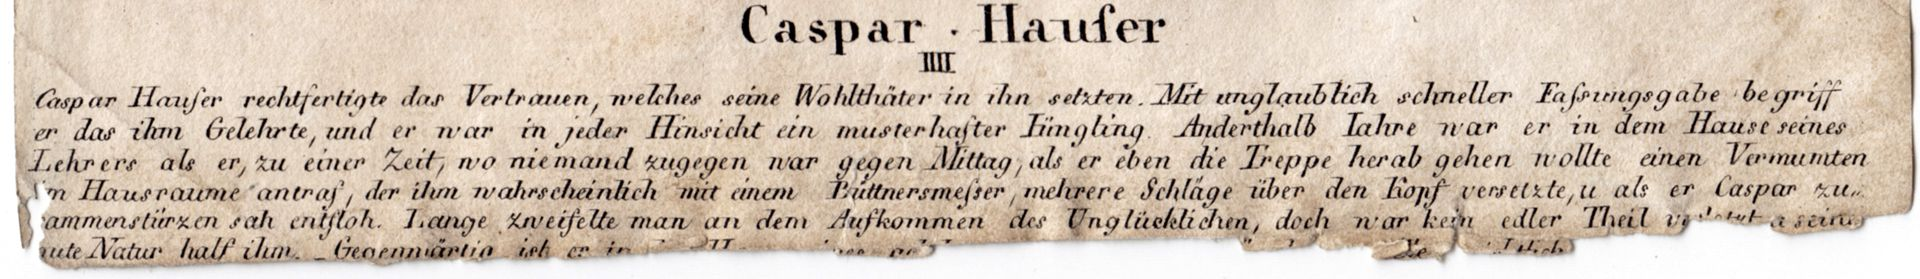 Caspar Hauser  IV Bildunterschrift